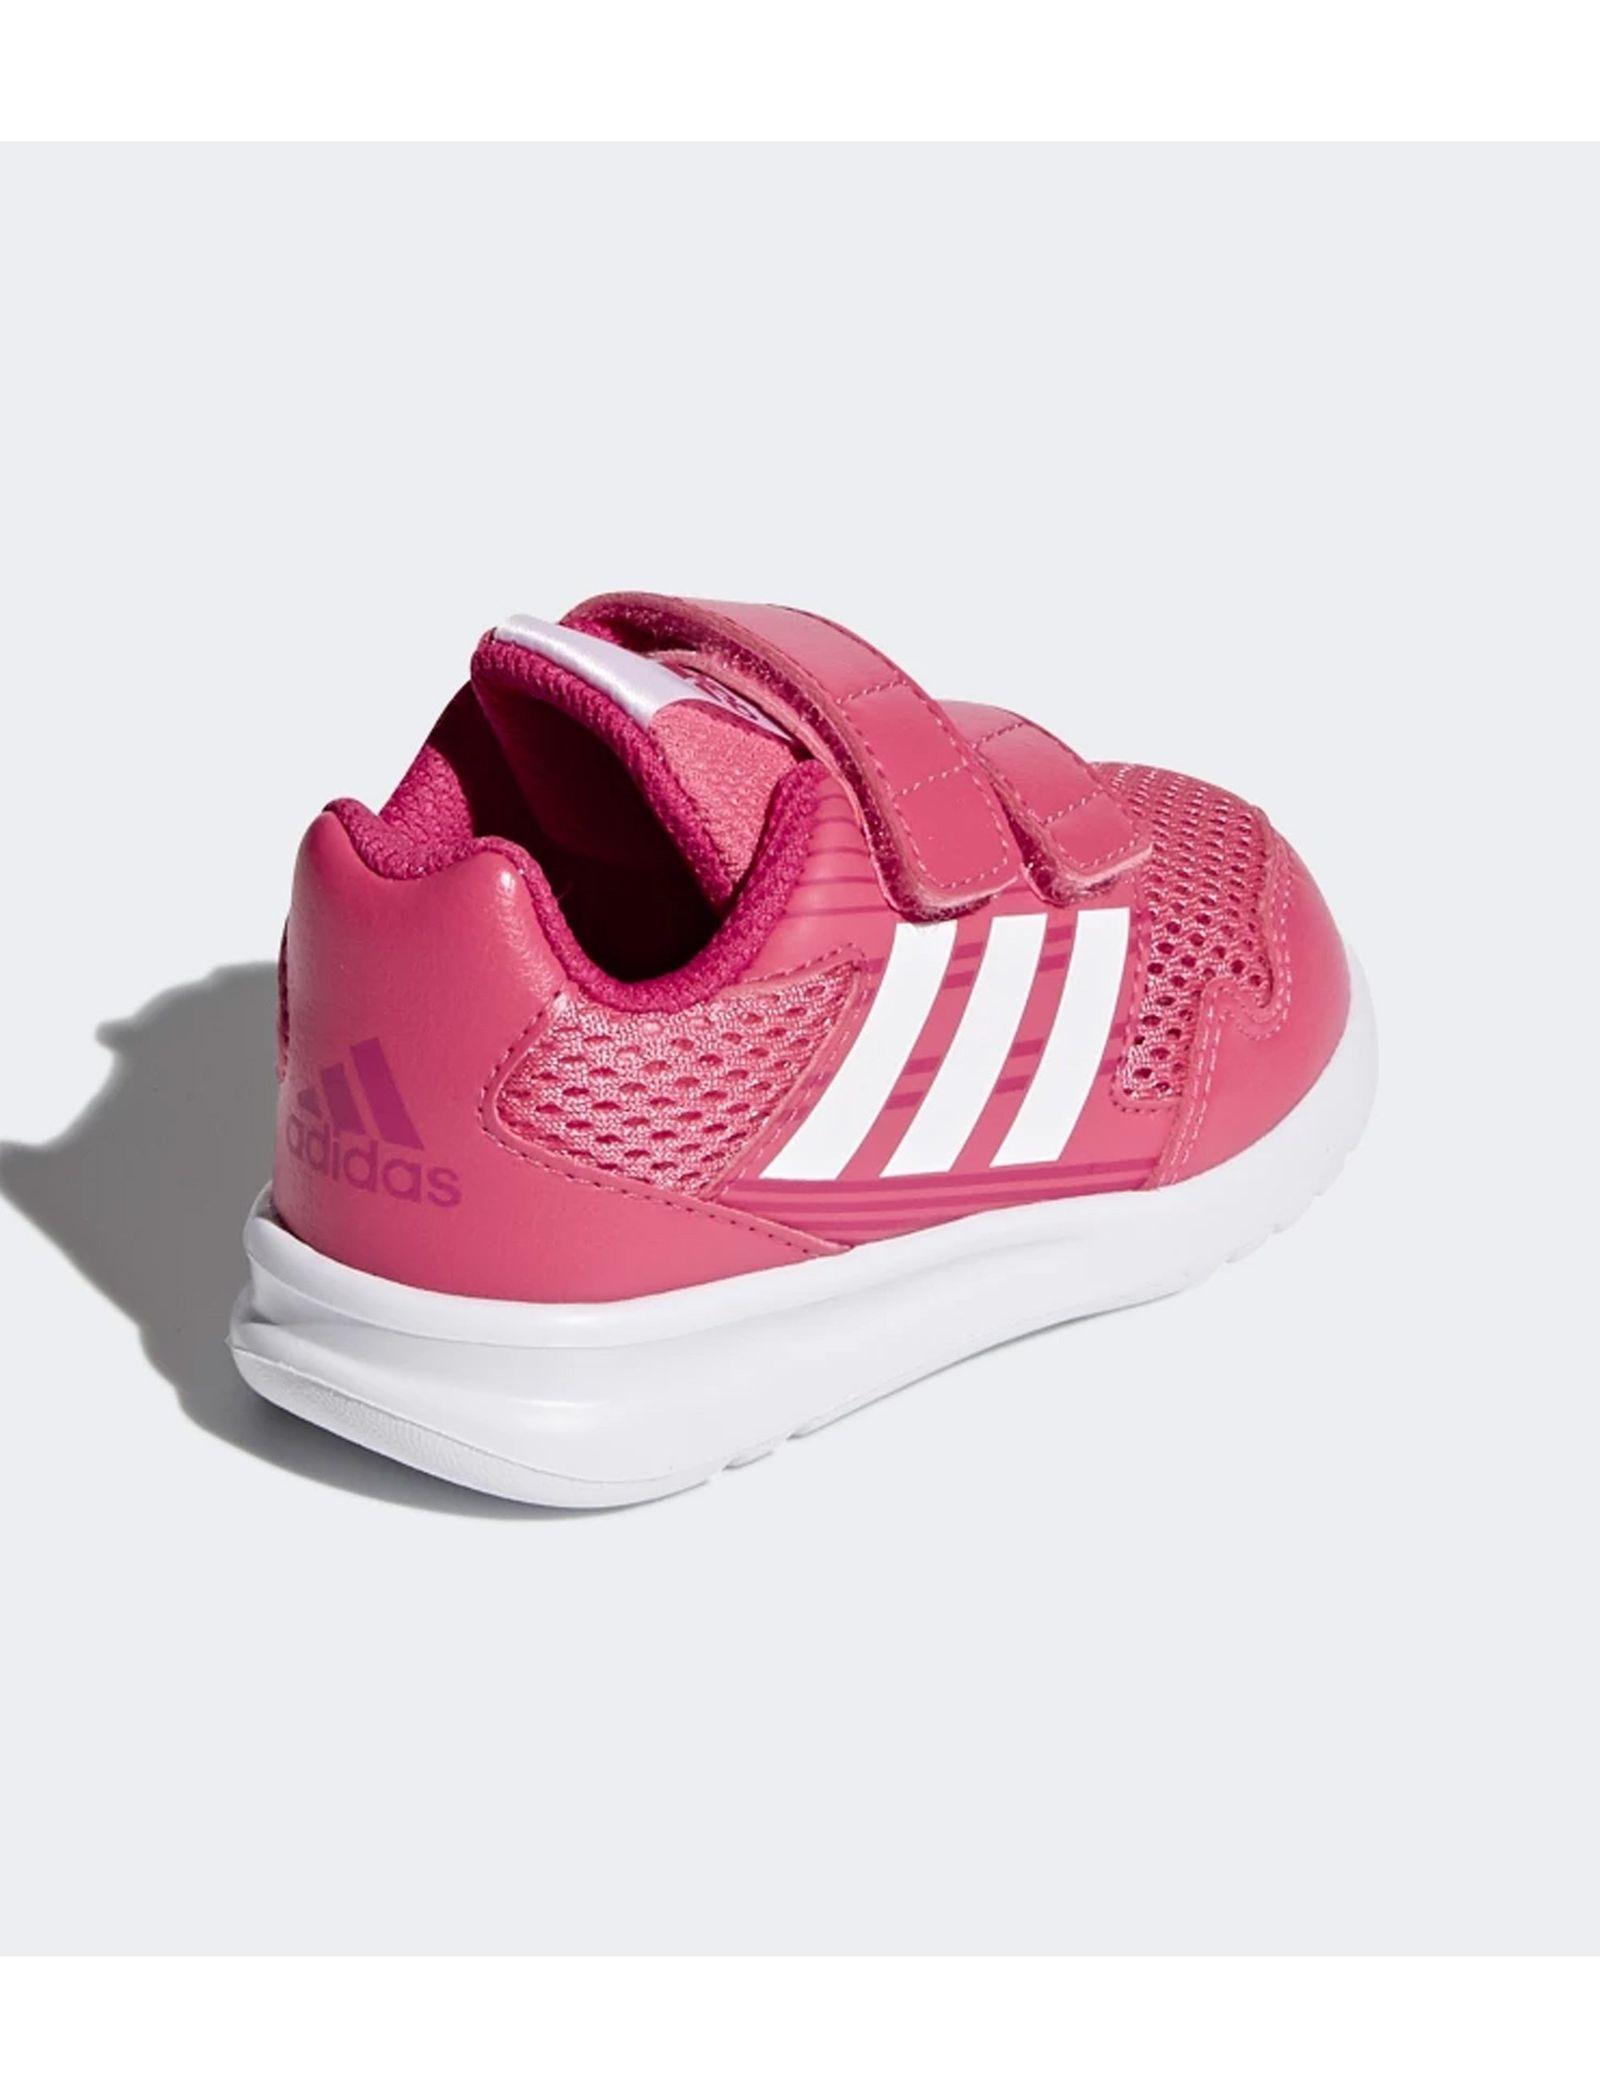 کفش دویدن چسبی نوزادی Altarun - آدیداس - صورتی - 5